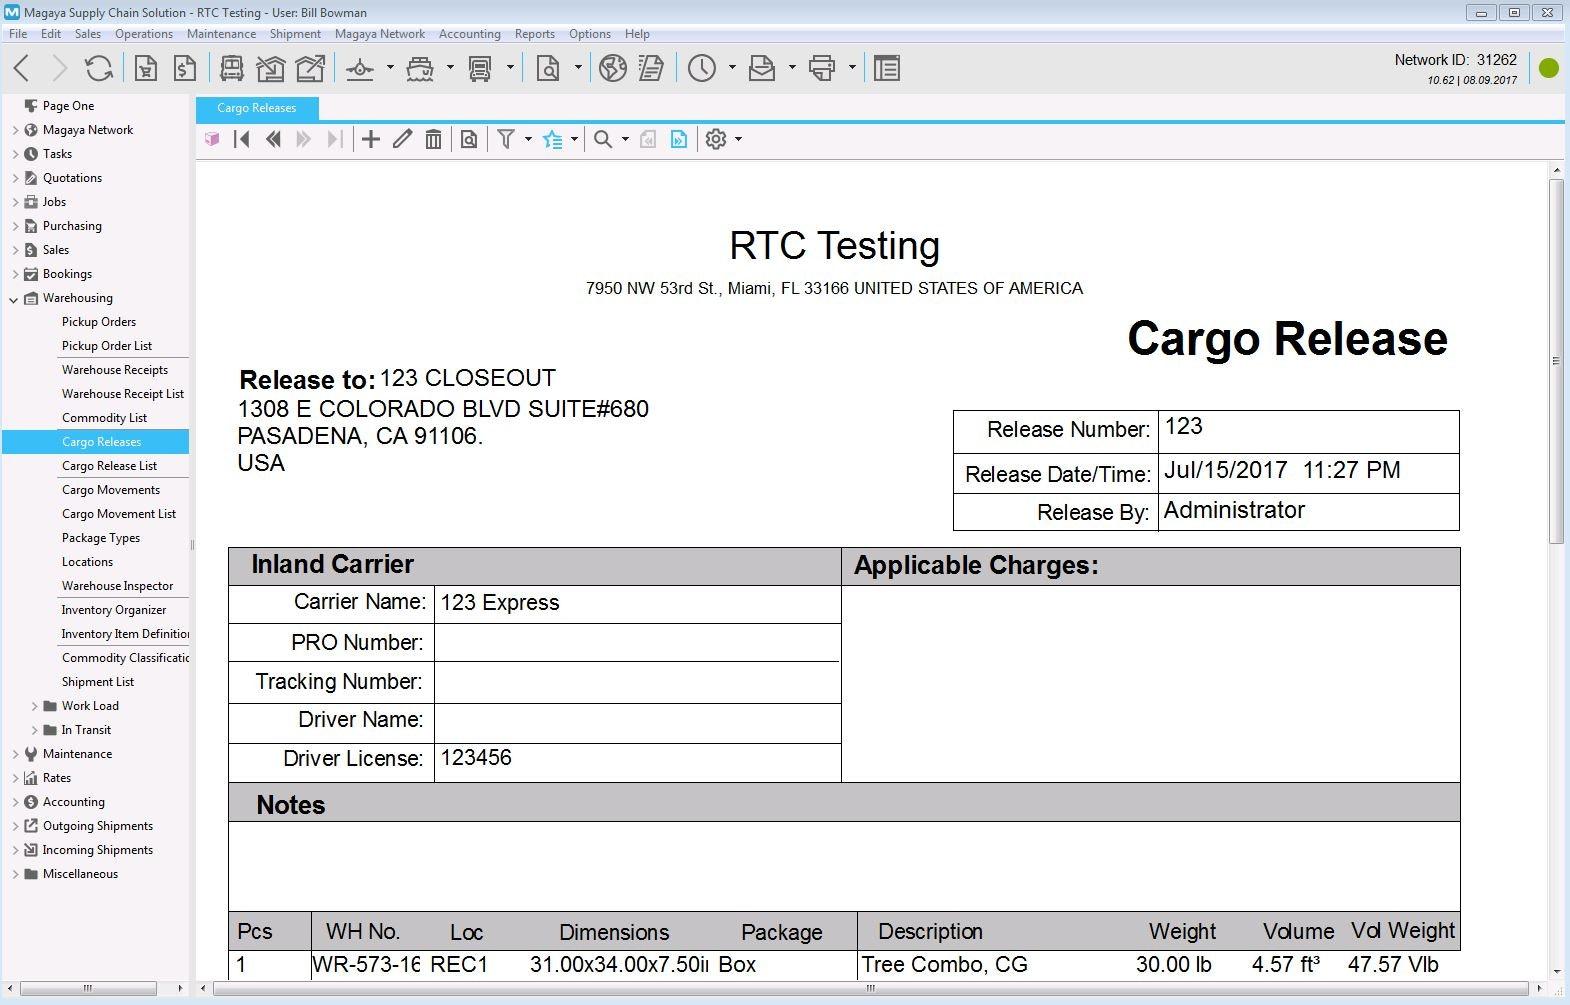 Cargo release